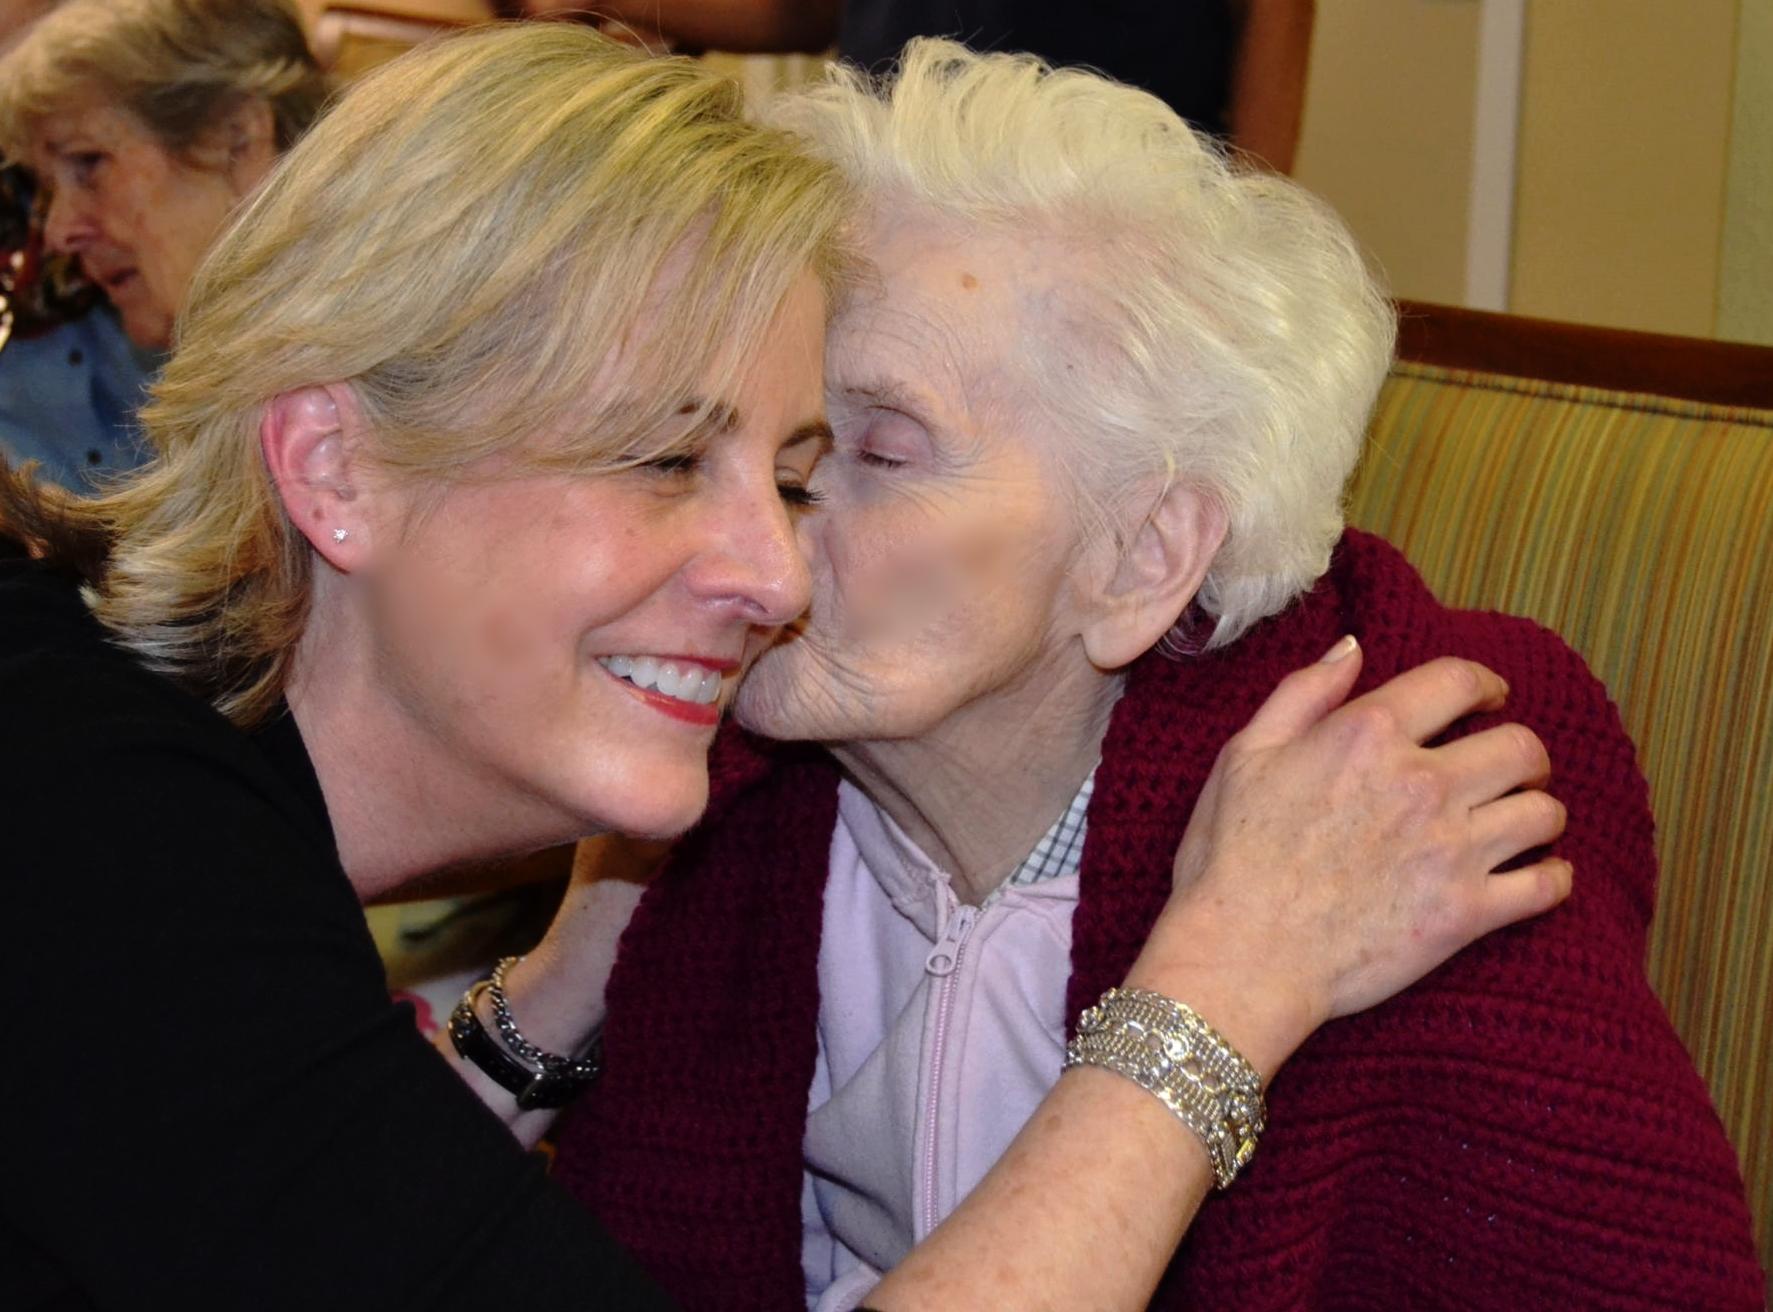 AE - Brookdale Roseville Louise giving Diane kiss.JPG